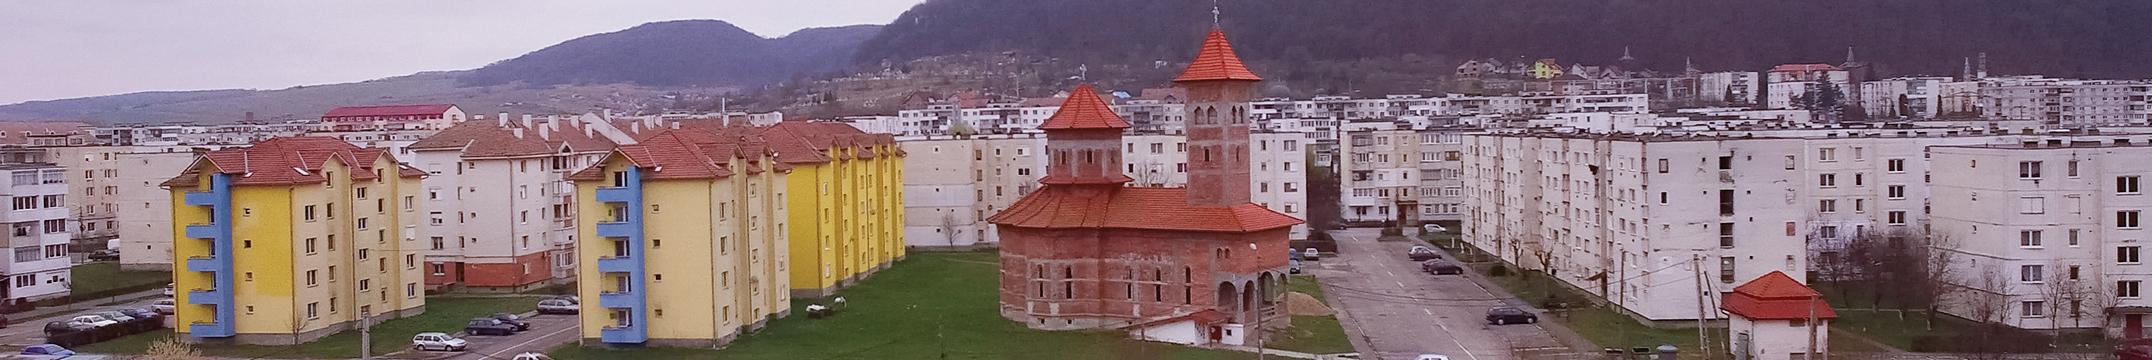 Romania_Screenshots_9.jpg